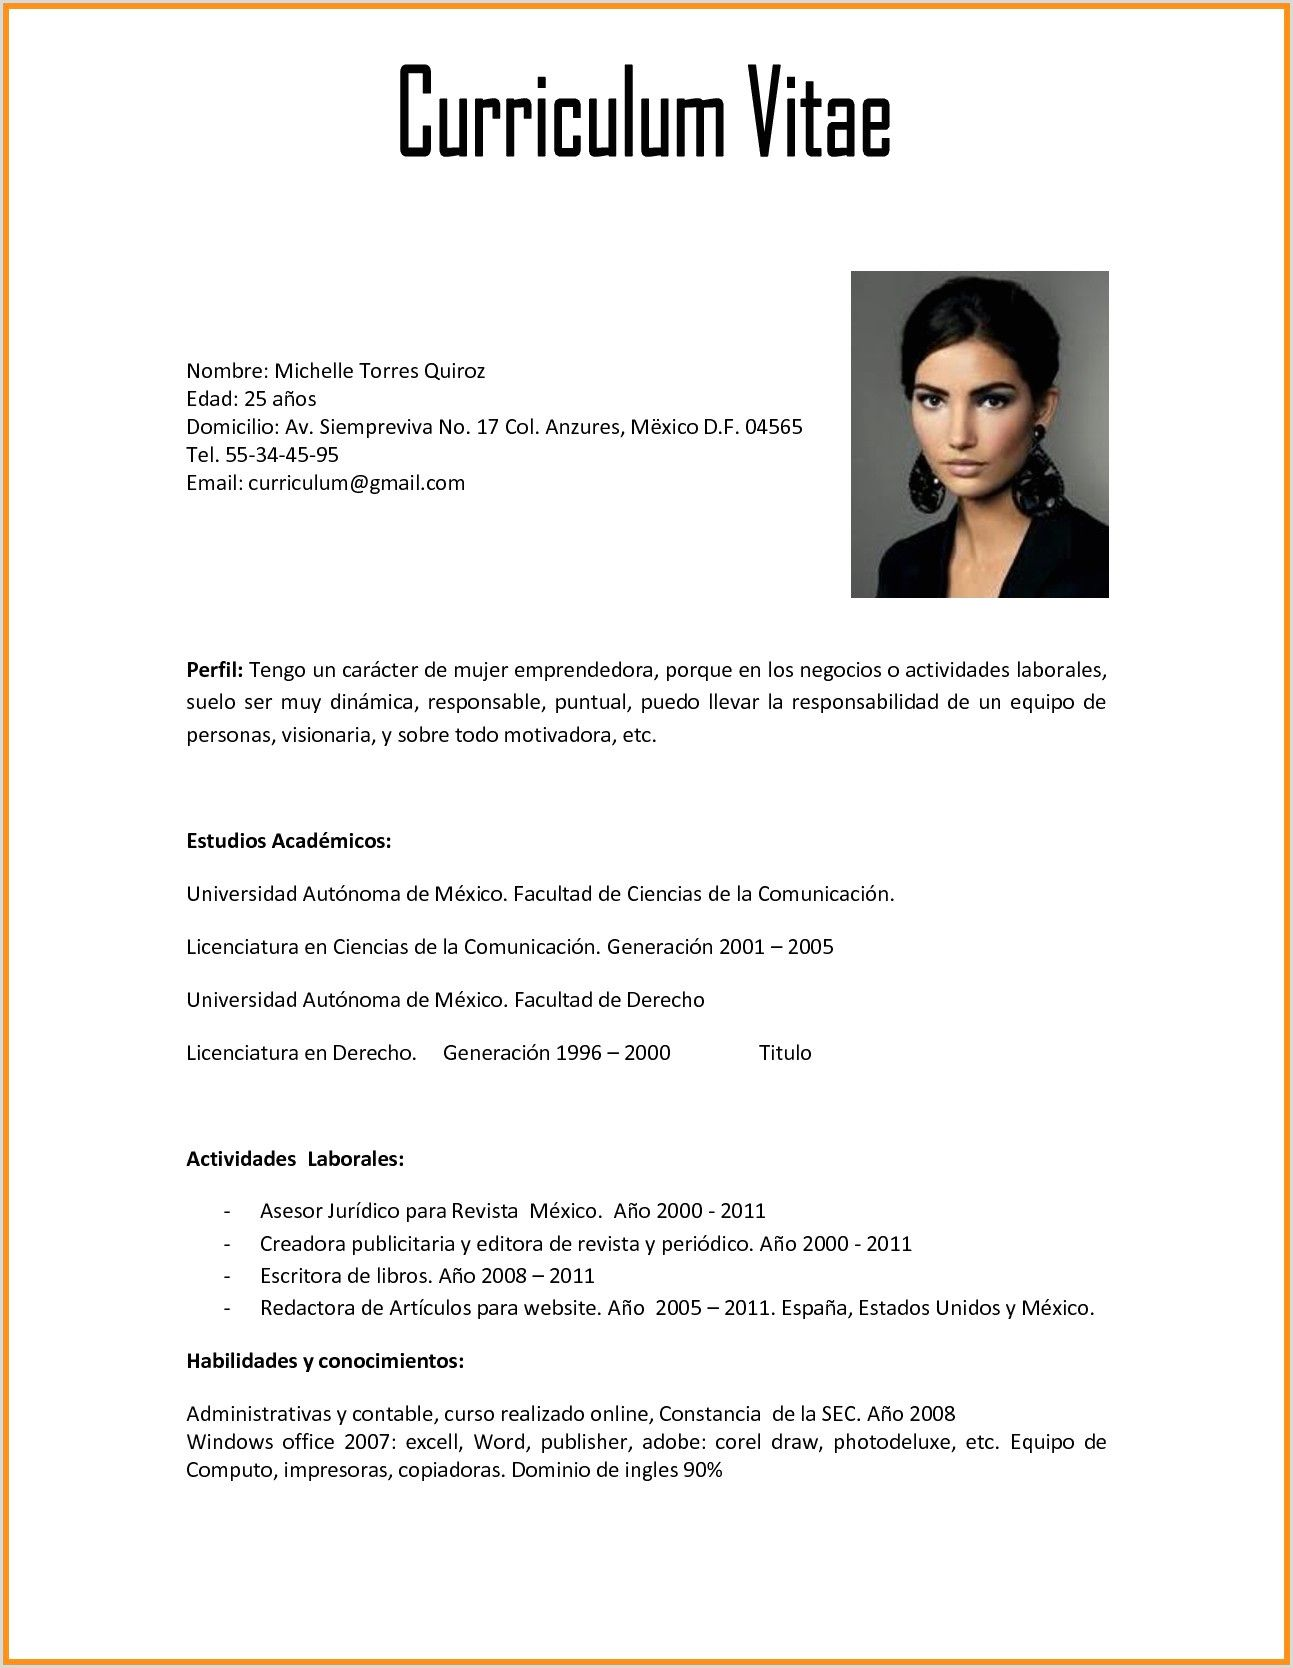 Plantillas Para Cv Simple ë å Curriculum Actor Plantilla Curriculum Vitae Curriculum Vitae Resume Curriculum